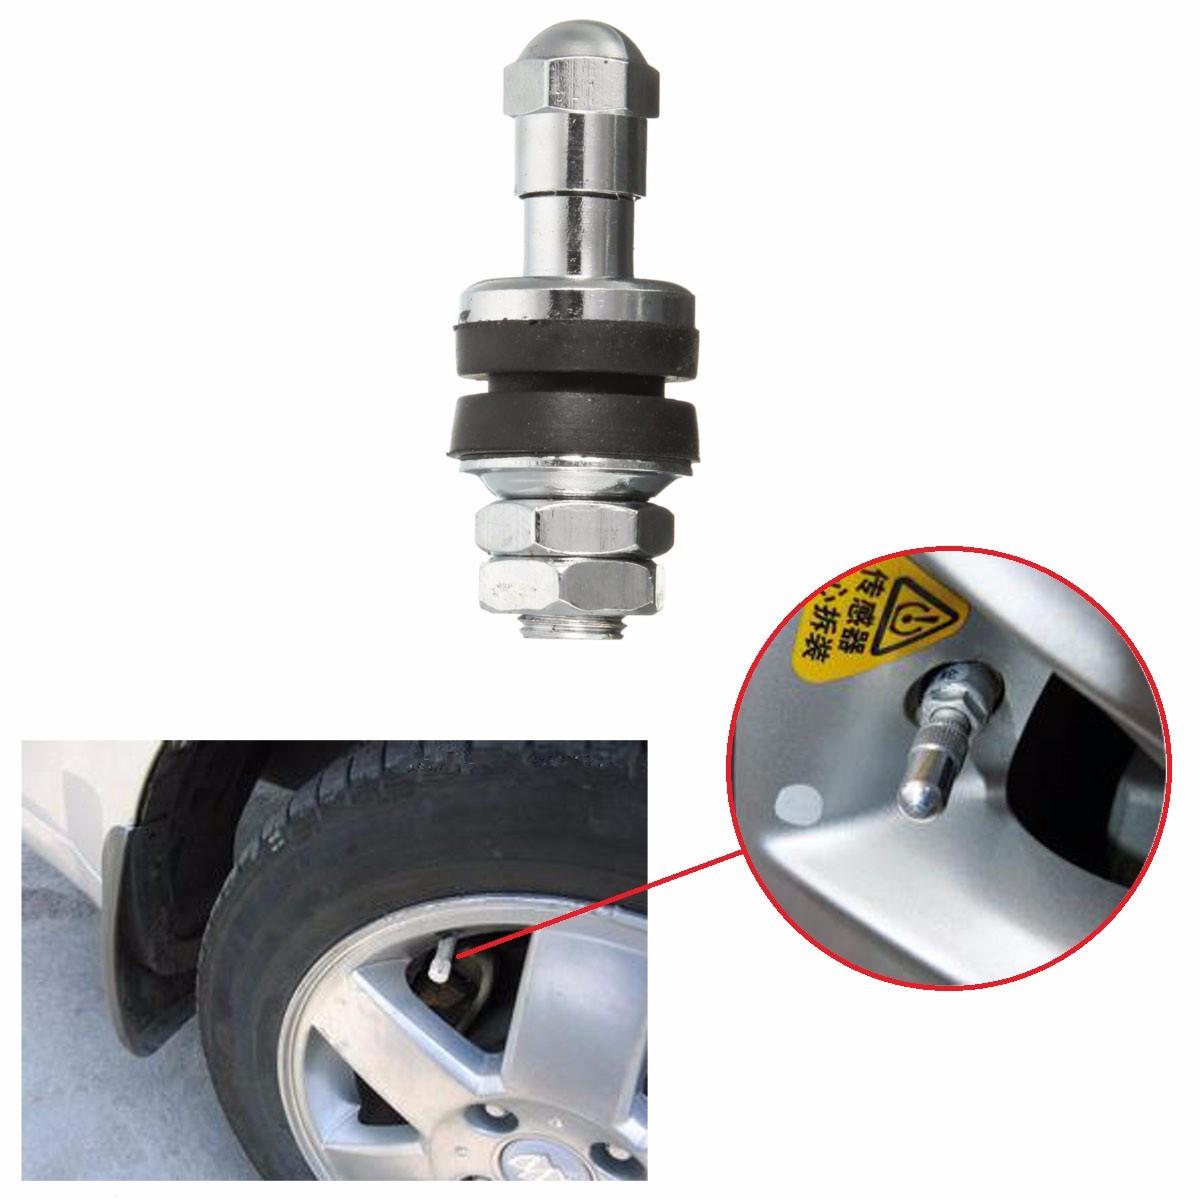 4 Piece Set Bolt In Flush Mount Metal Tire Valve Stems High Pressure CHROME